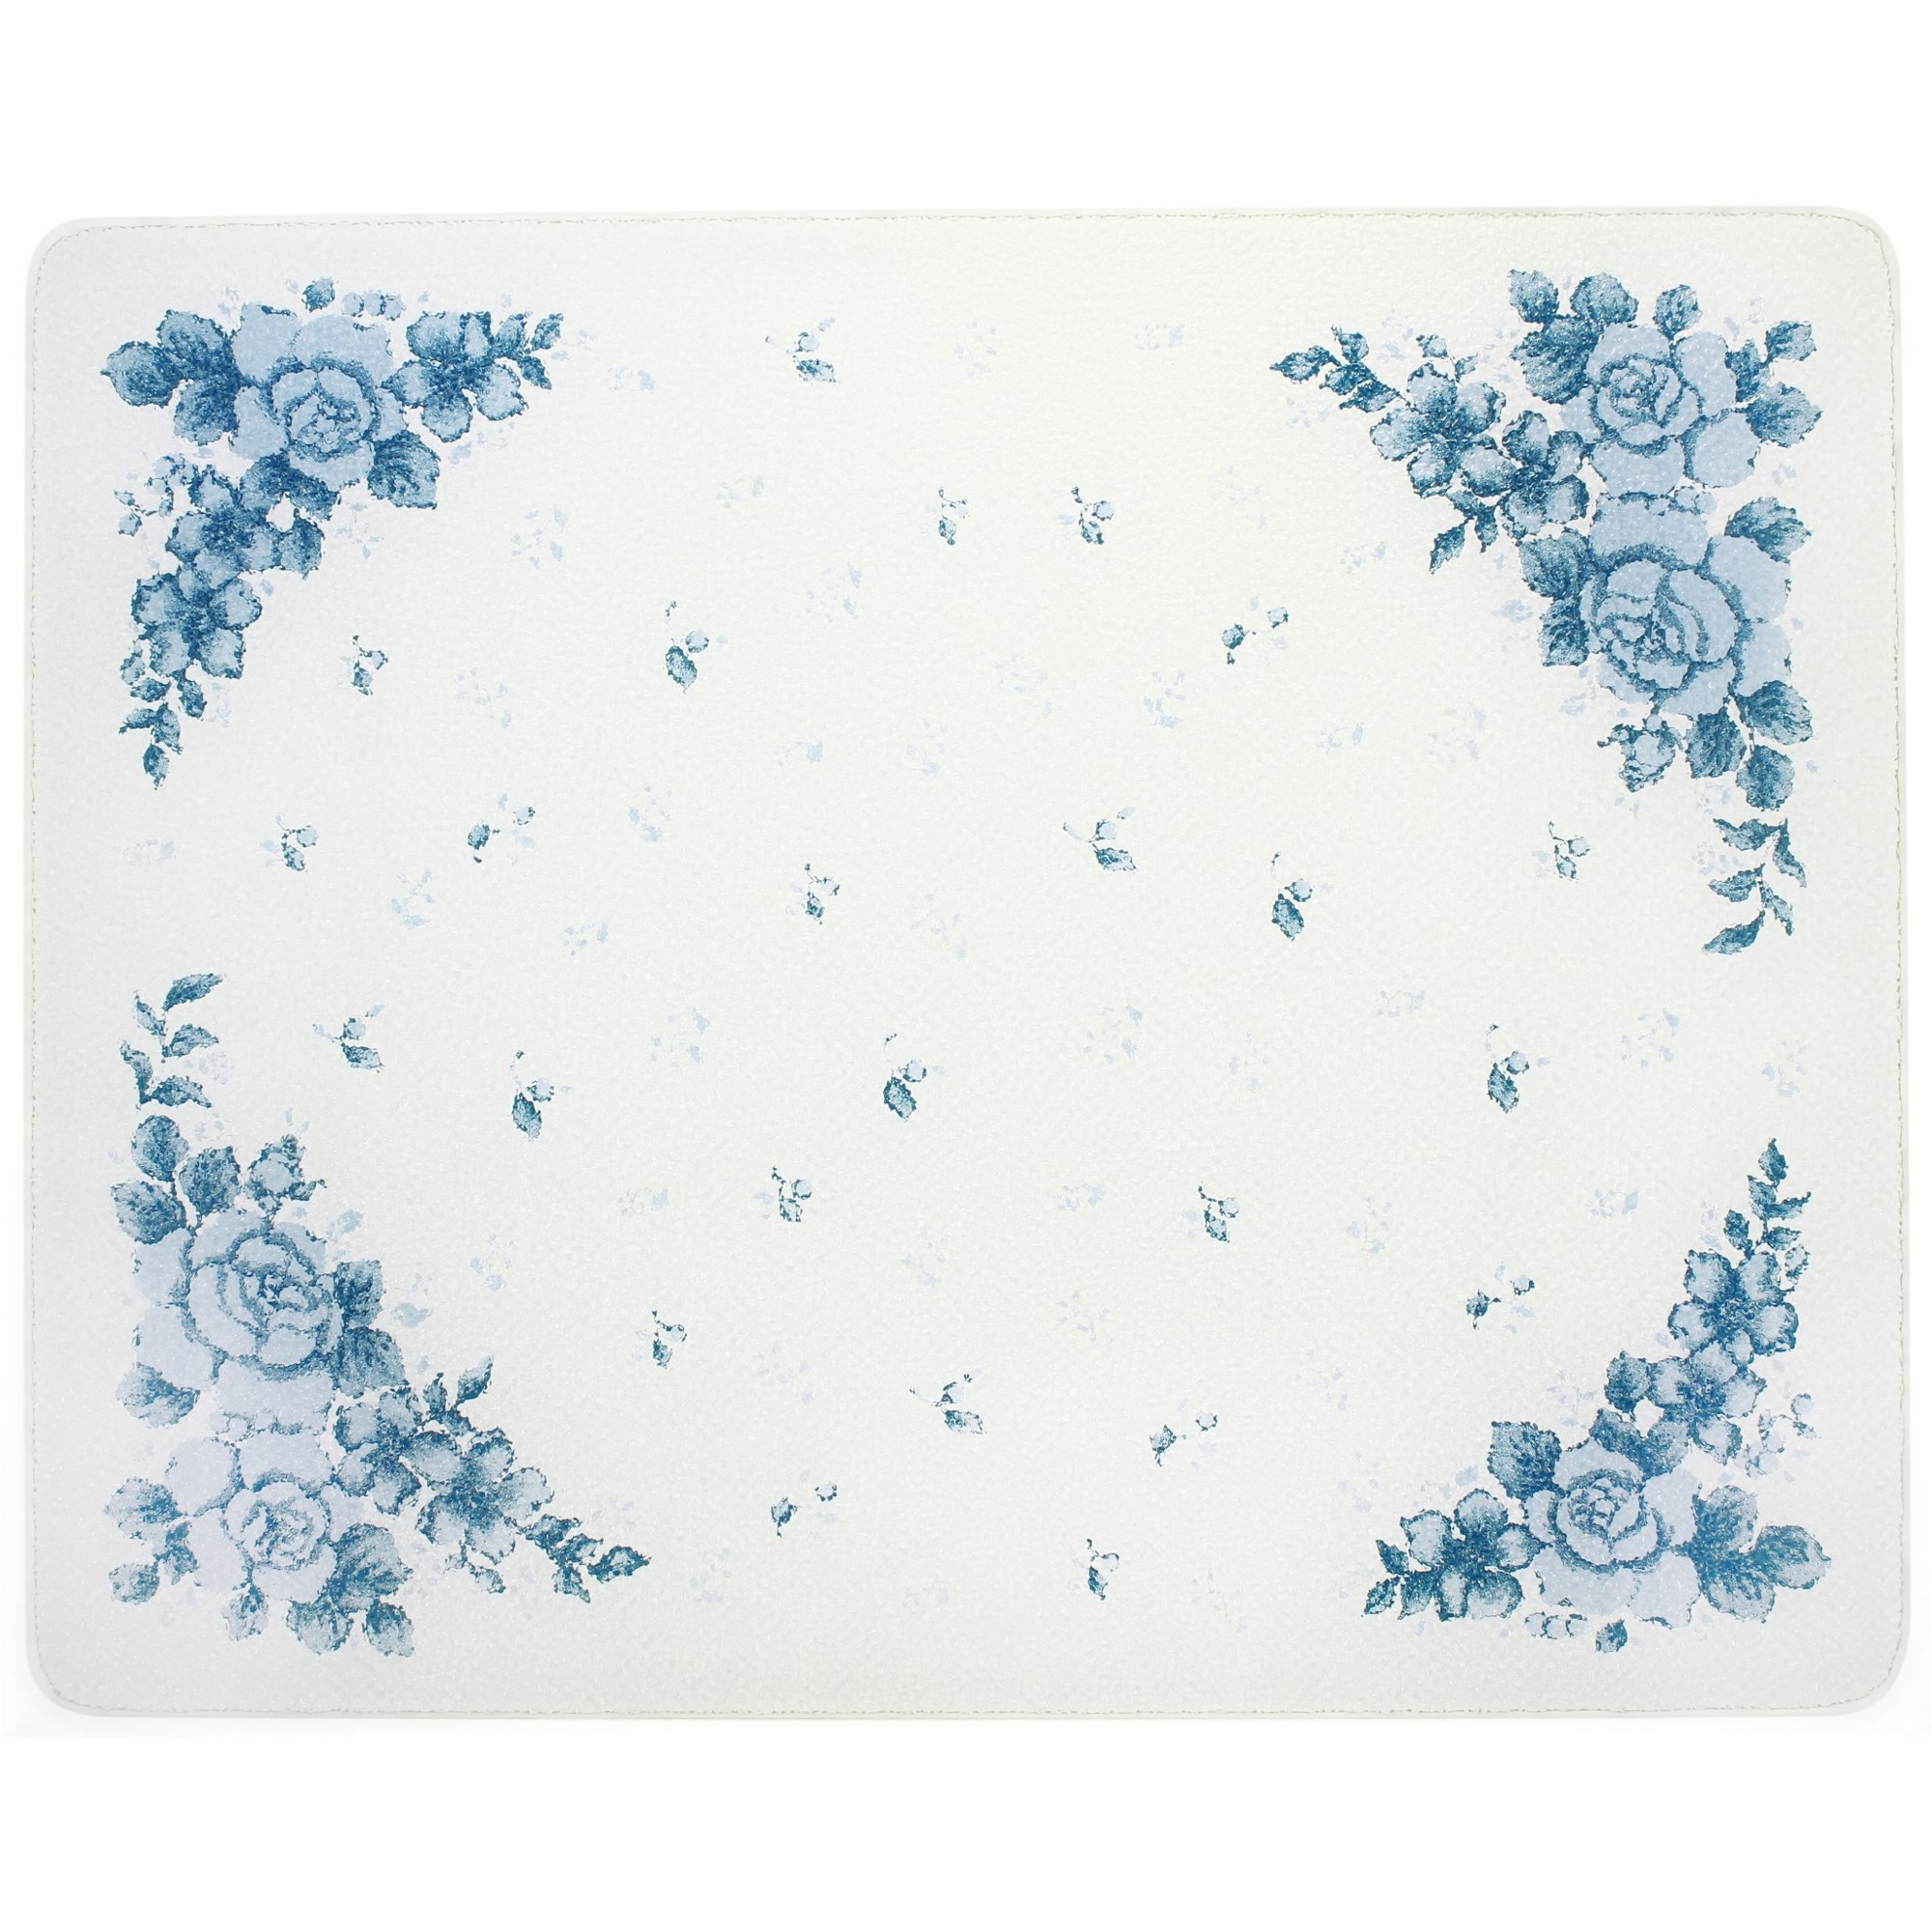 Corelle Blue Velvet 20 X 16 inch Counter Saver Tempered Glass Cutting Board, 92016VLTH